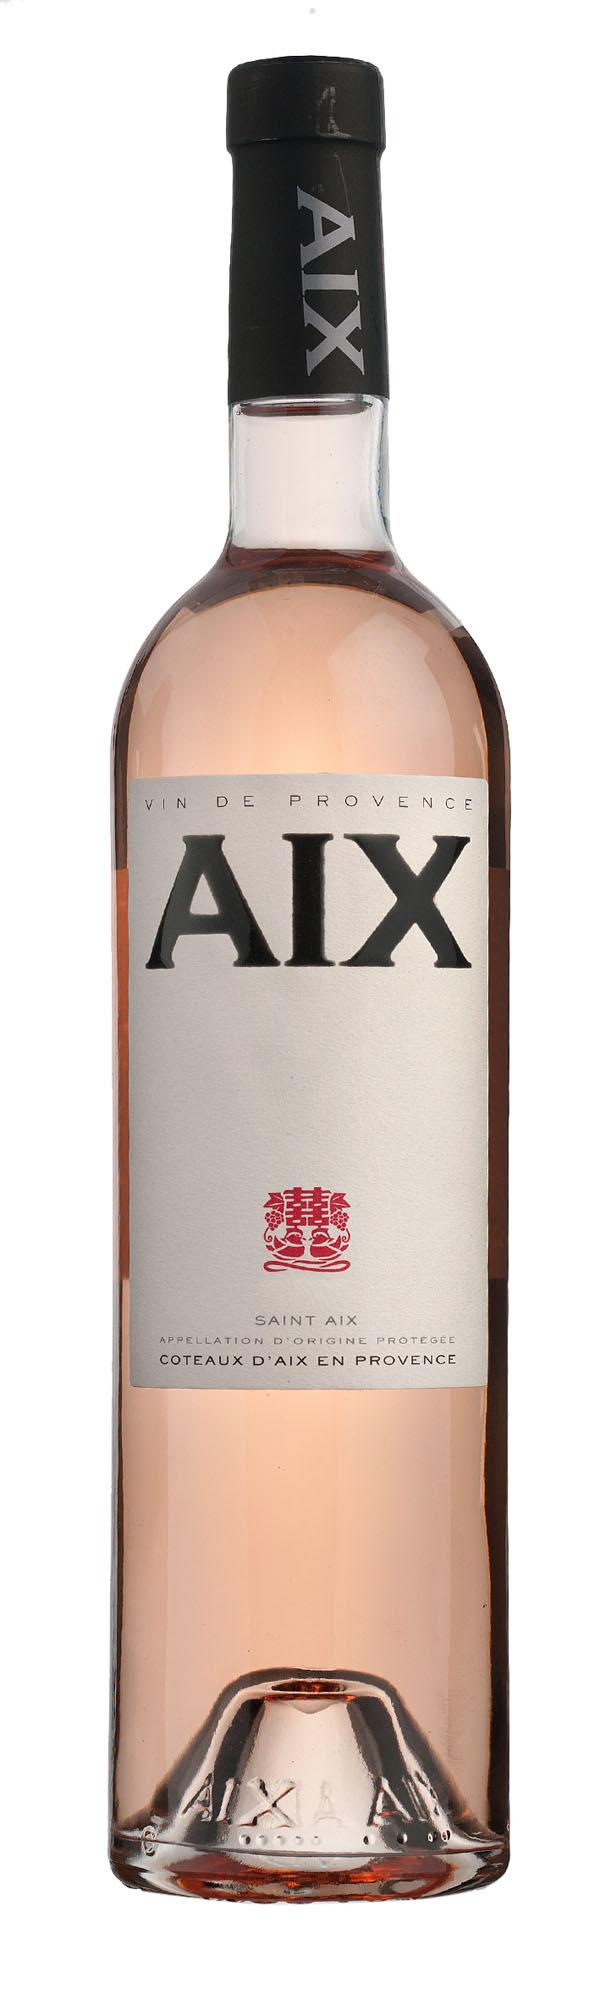 AIX rose Coteaux D'Aix en Provence